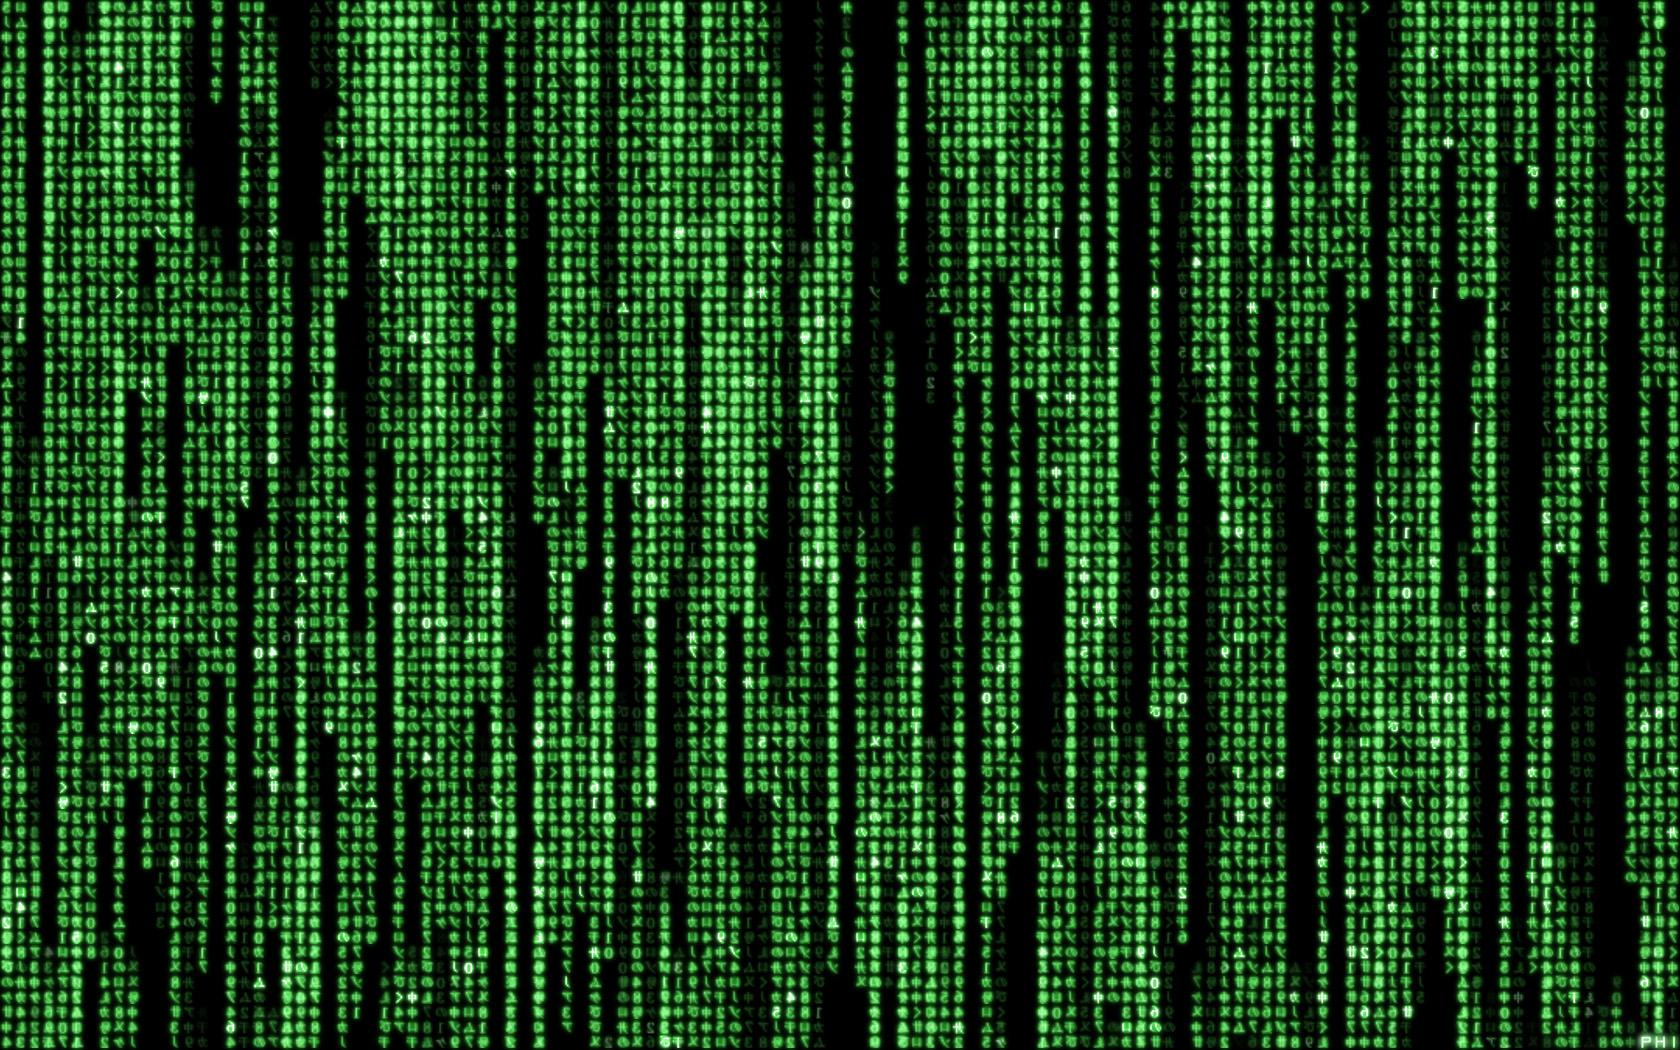 Matrix code by phi AU 1680x1050